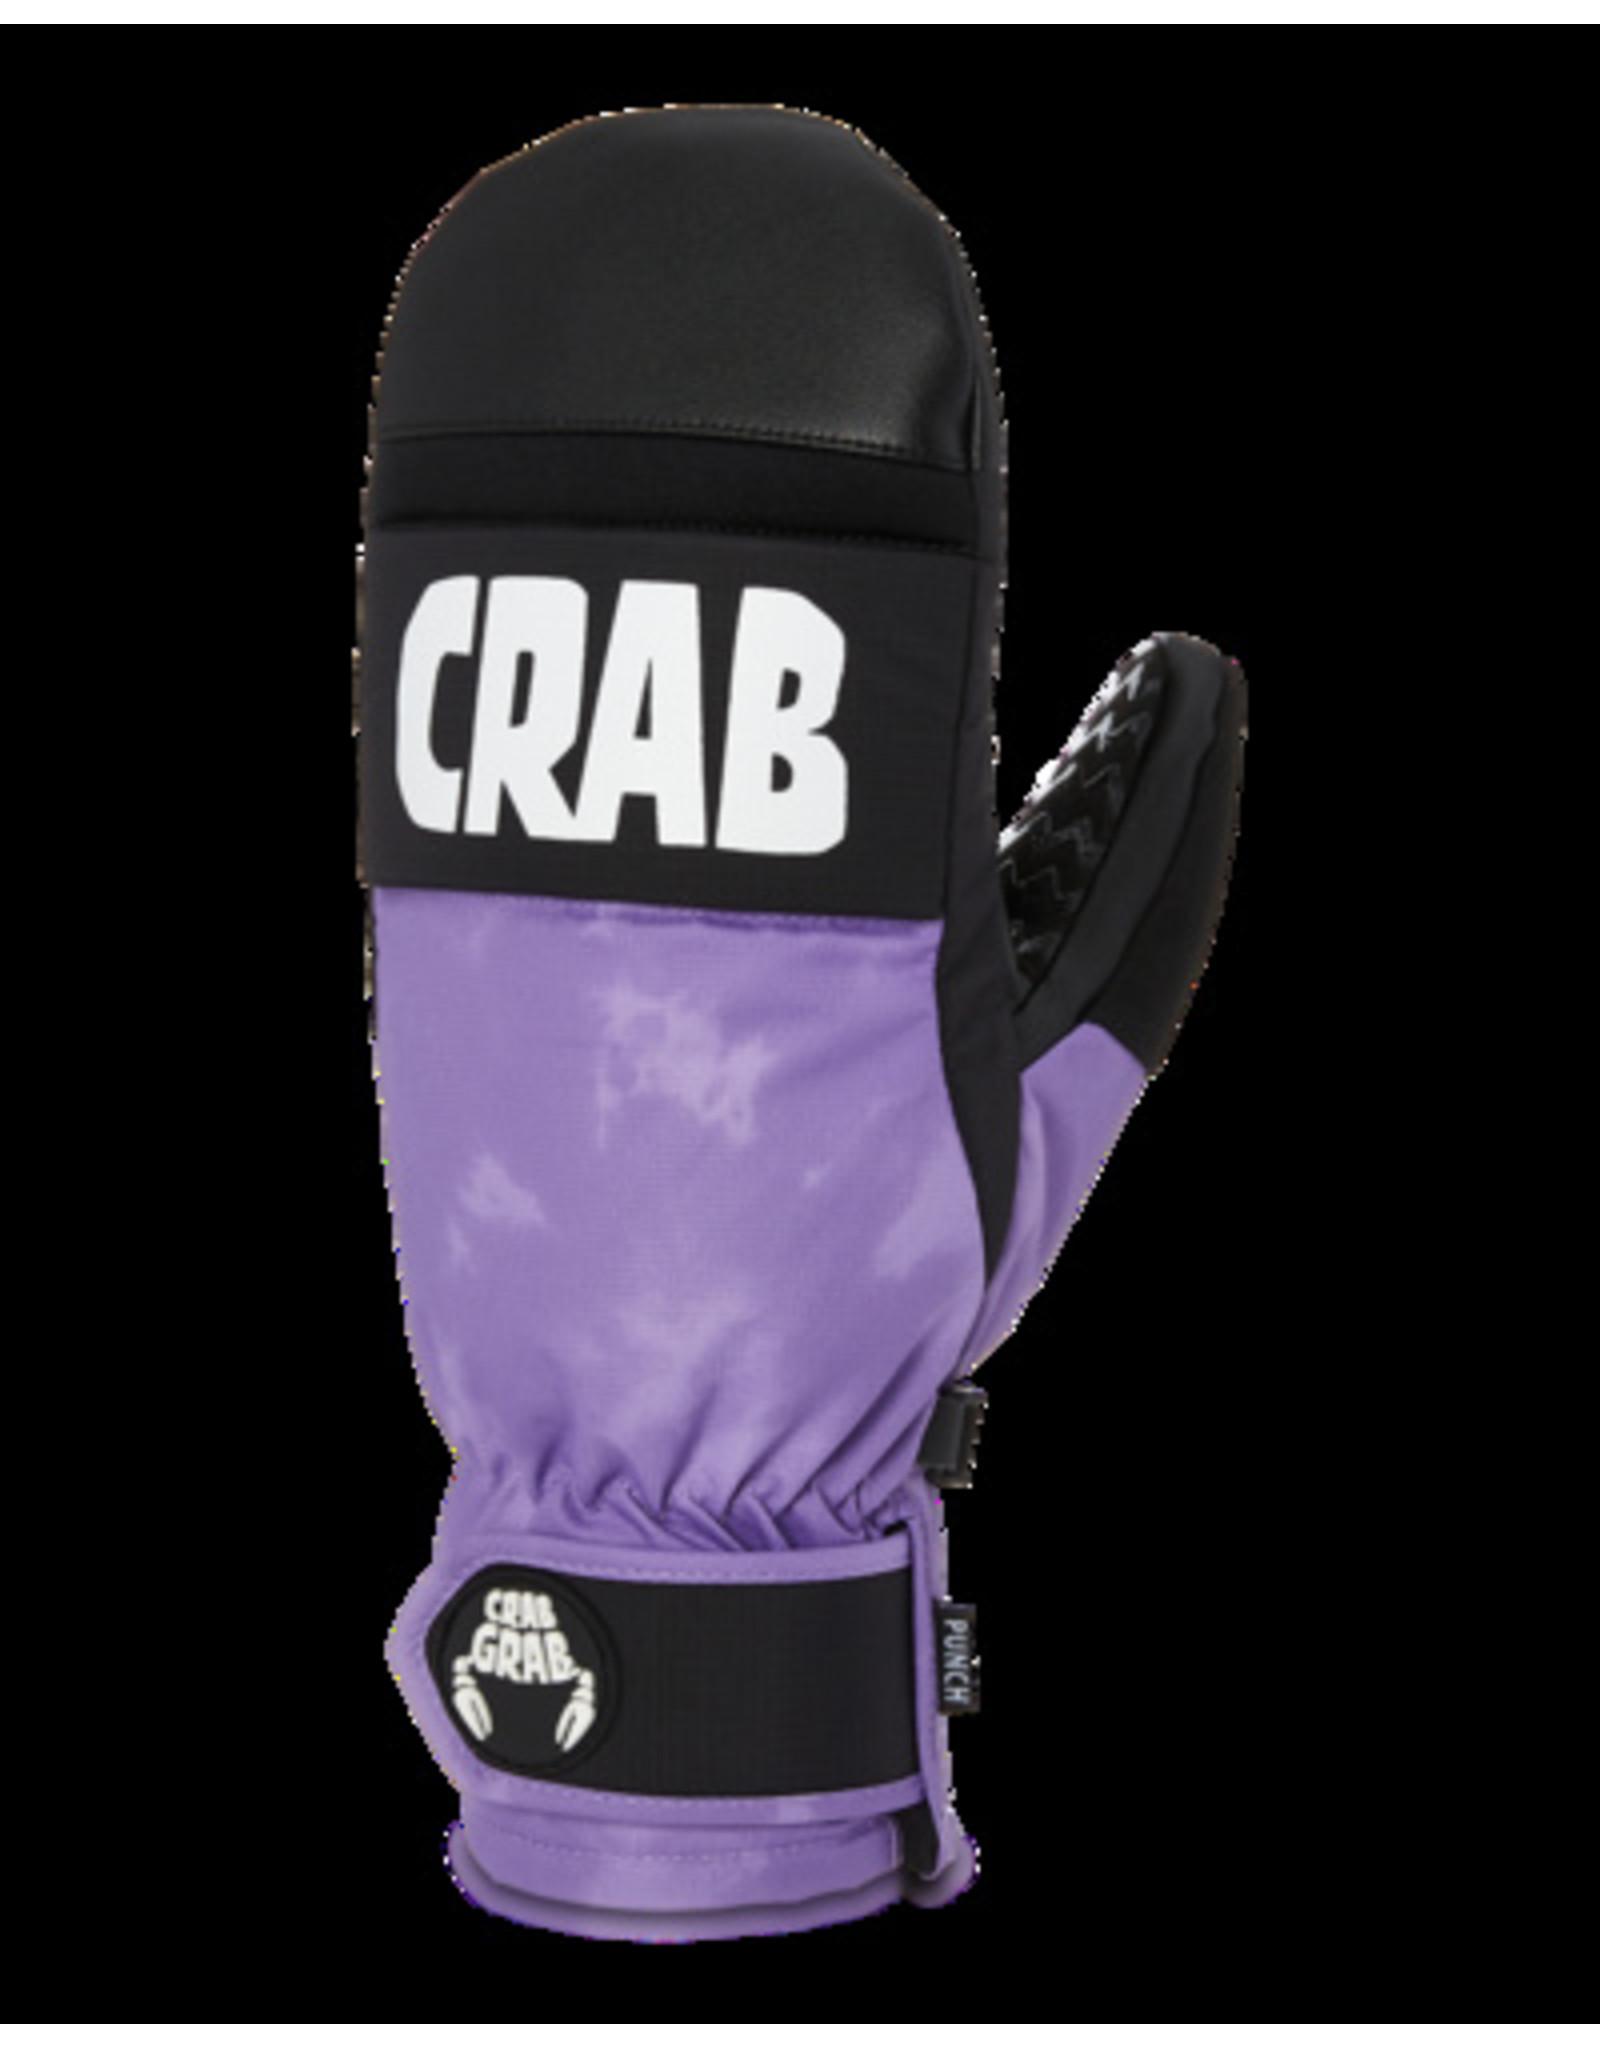 CRAB GRAB Punch Mitts